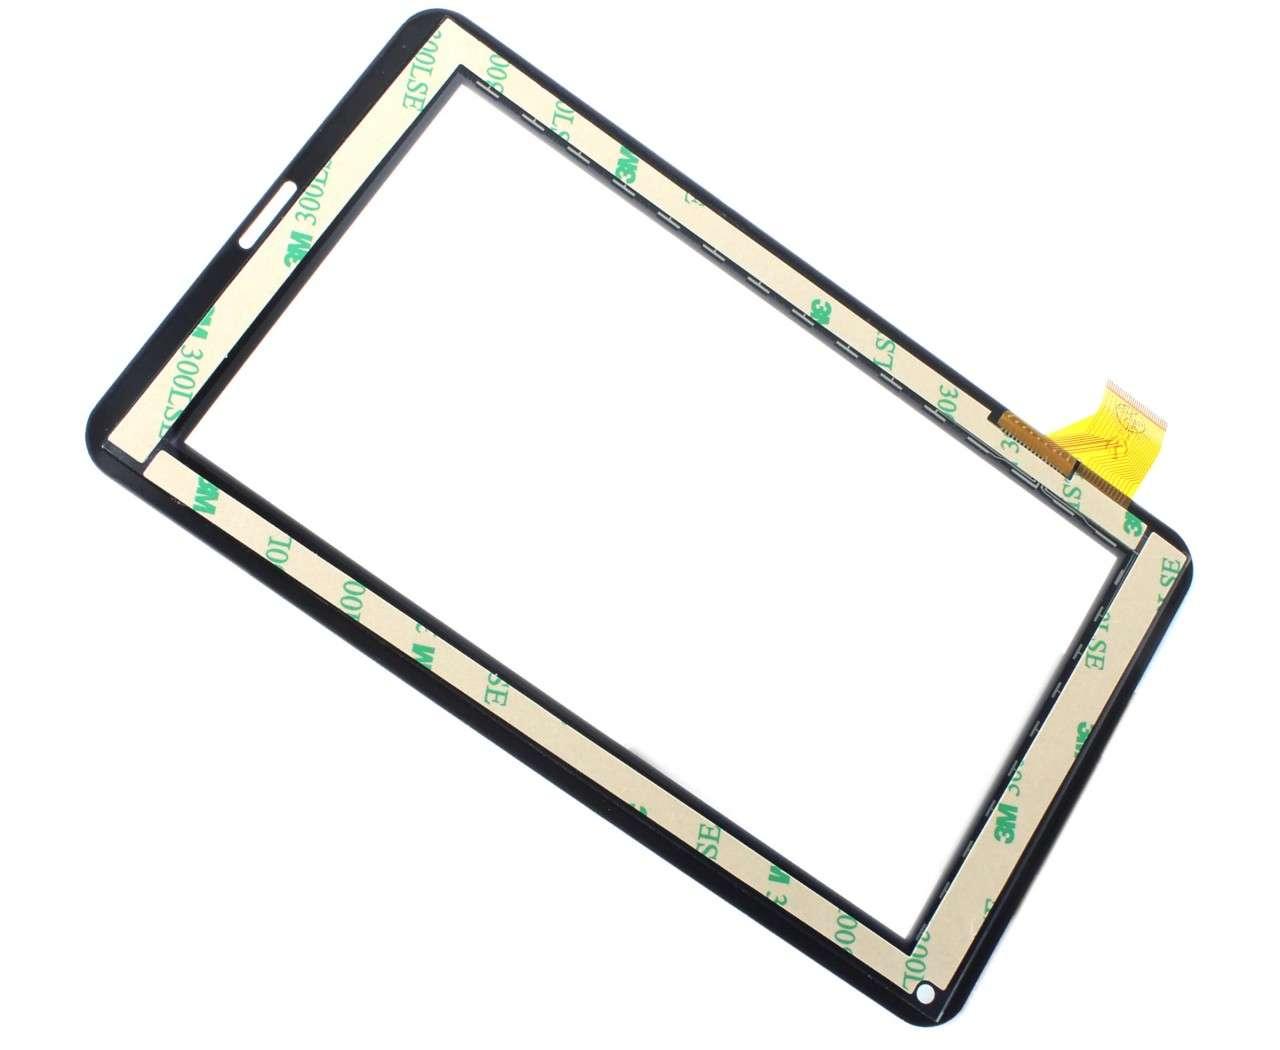 Touchscreen Digitizer Myria Connect S747G Geam Sticla Tableta imagine powerlaptop.ro 2021